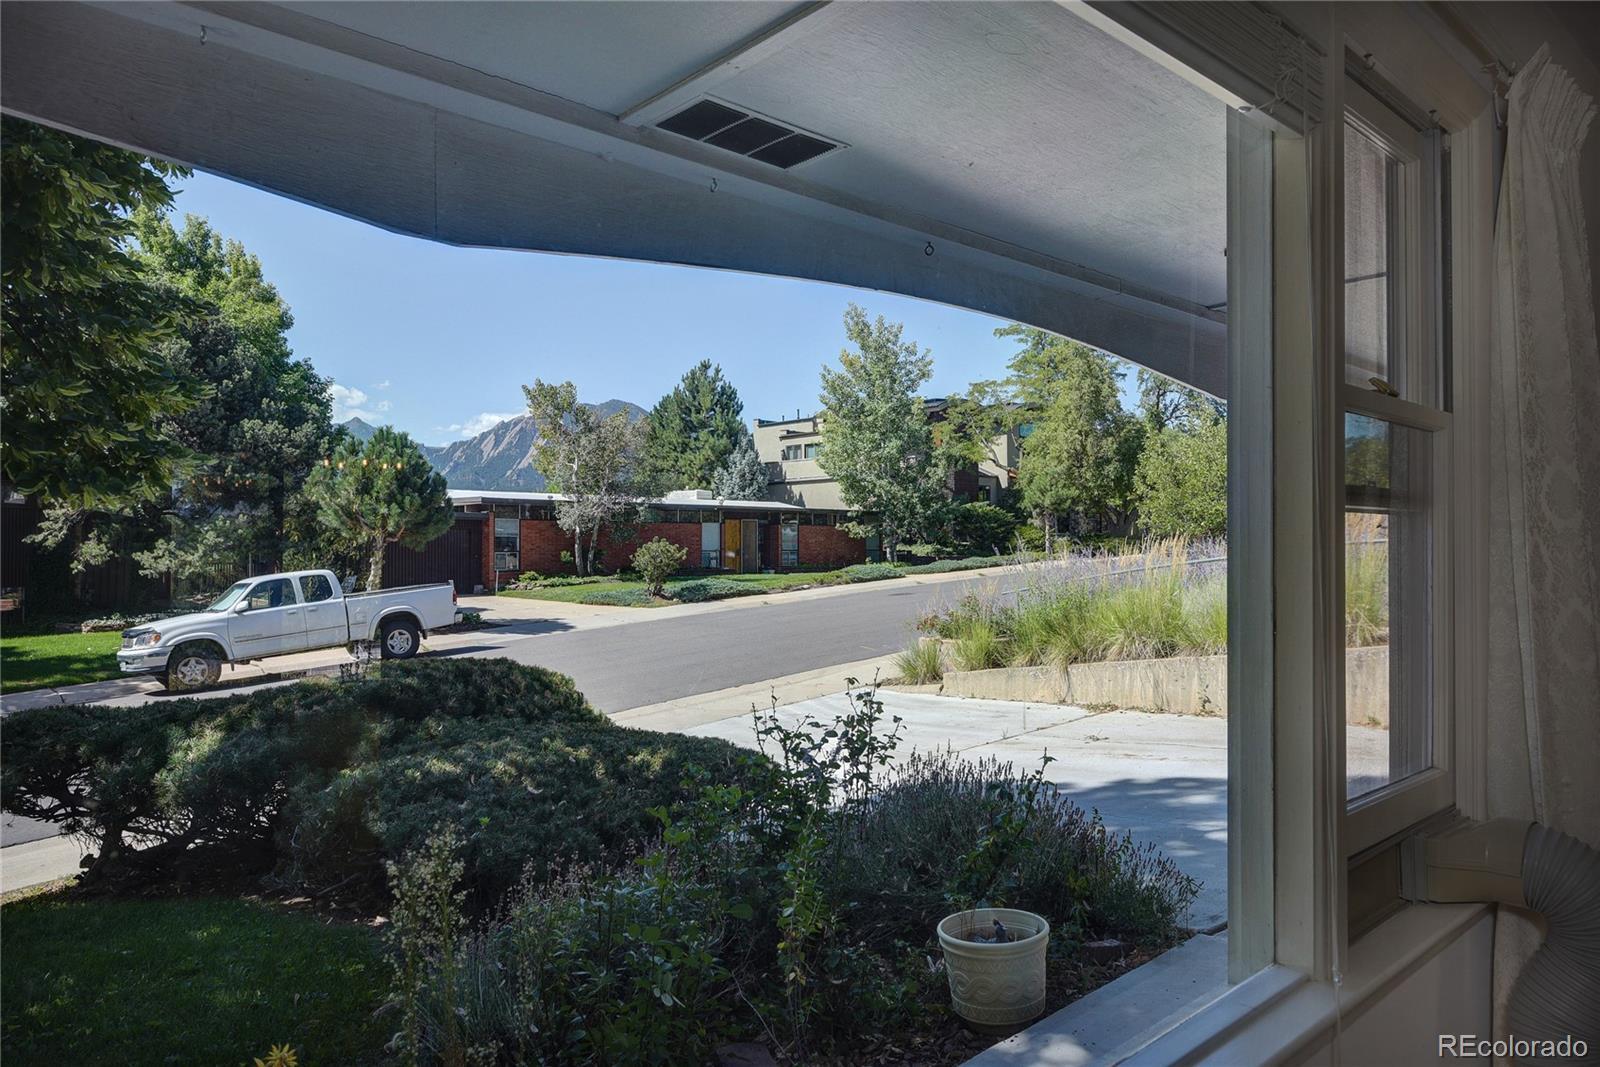 MLS# 3086362 - 14 - 2445 Balsam Drive, Boulder, CO 80304